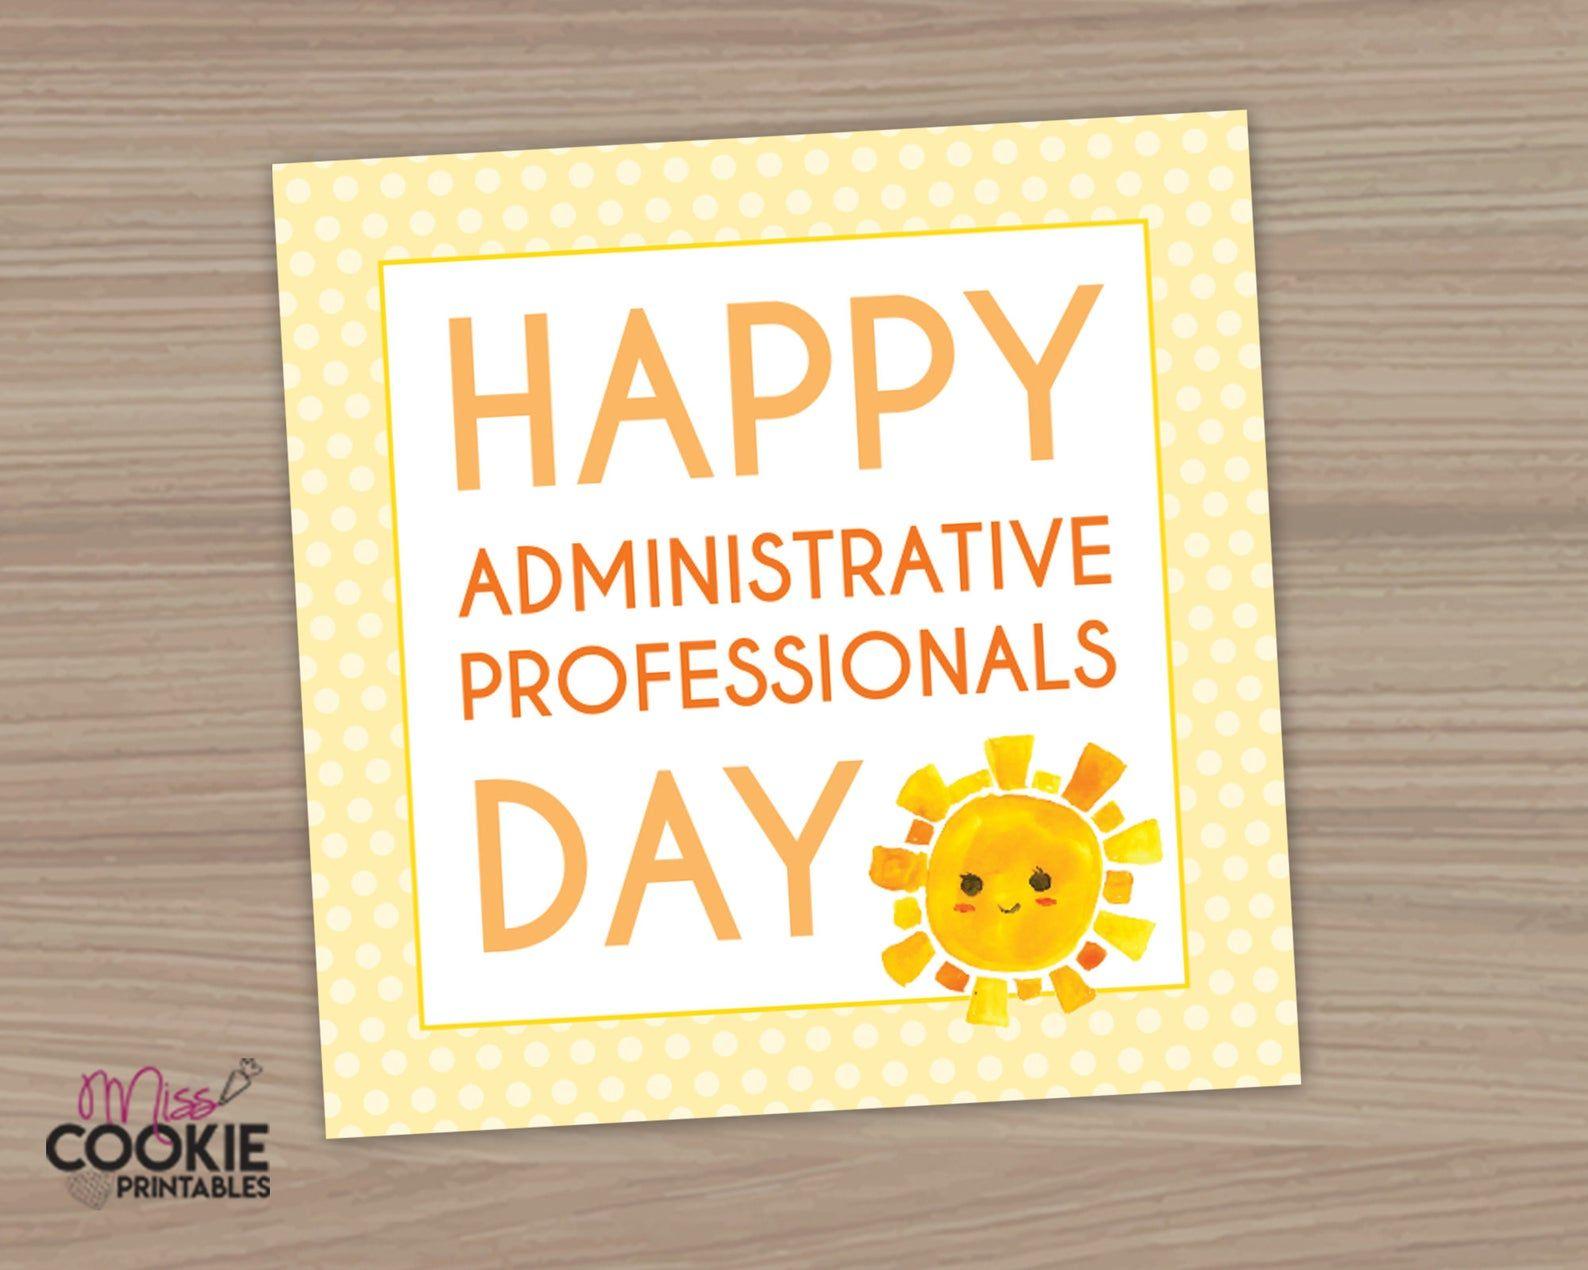 Printable Happy Administrative Professionals Day Tag 2 Inch Etsy In 2021 Administrative Professional Day Admin Professionals Day Administrative Professional